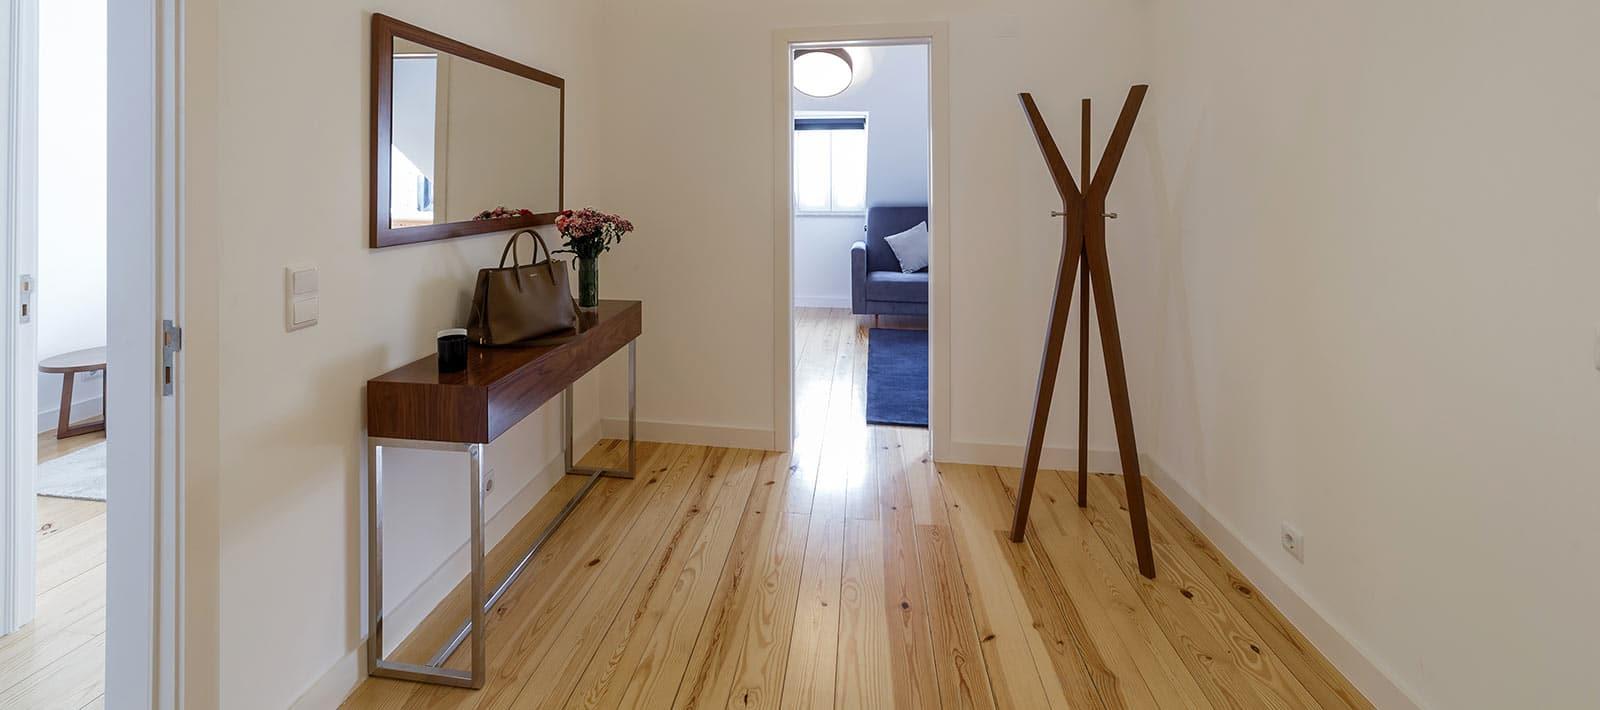 hardwood floors in northern virginia home